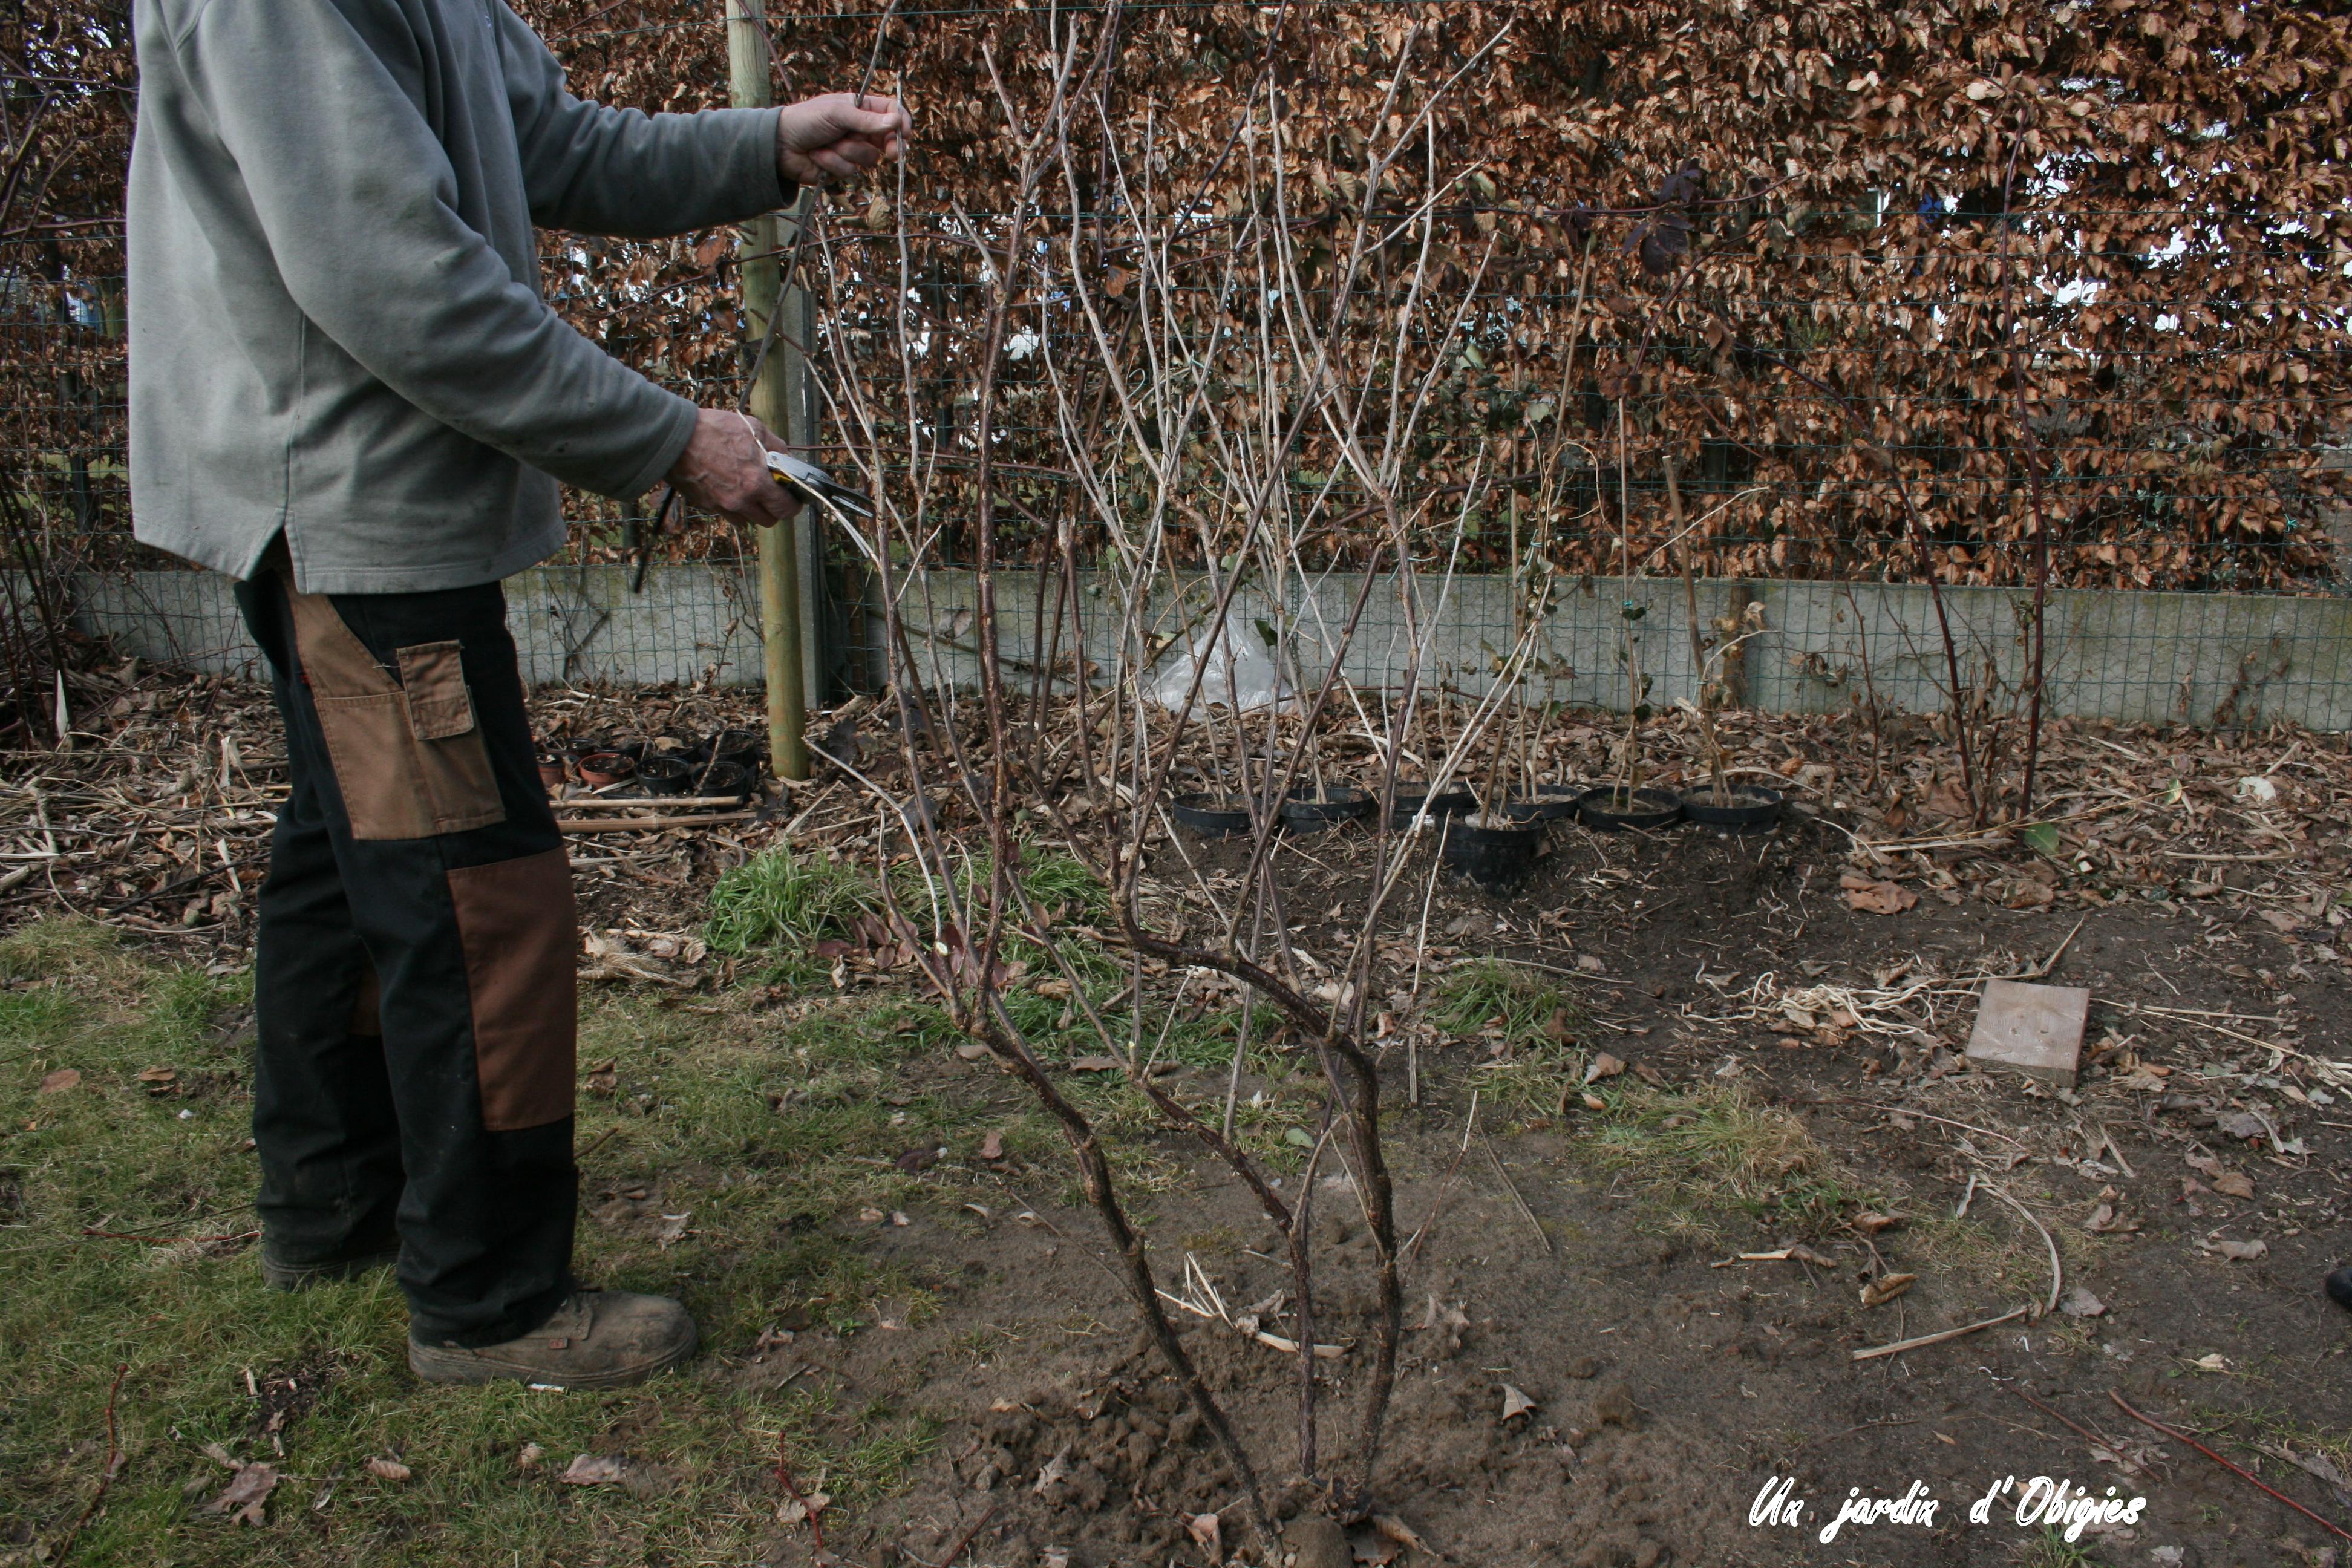 Taille d' un groseillier dans un jardin d' Obigies